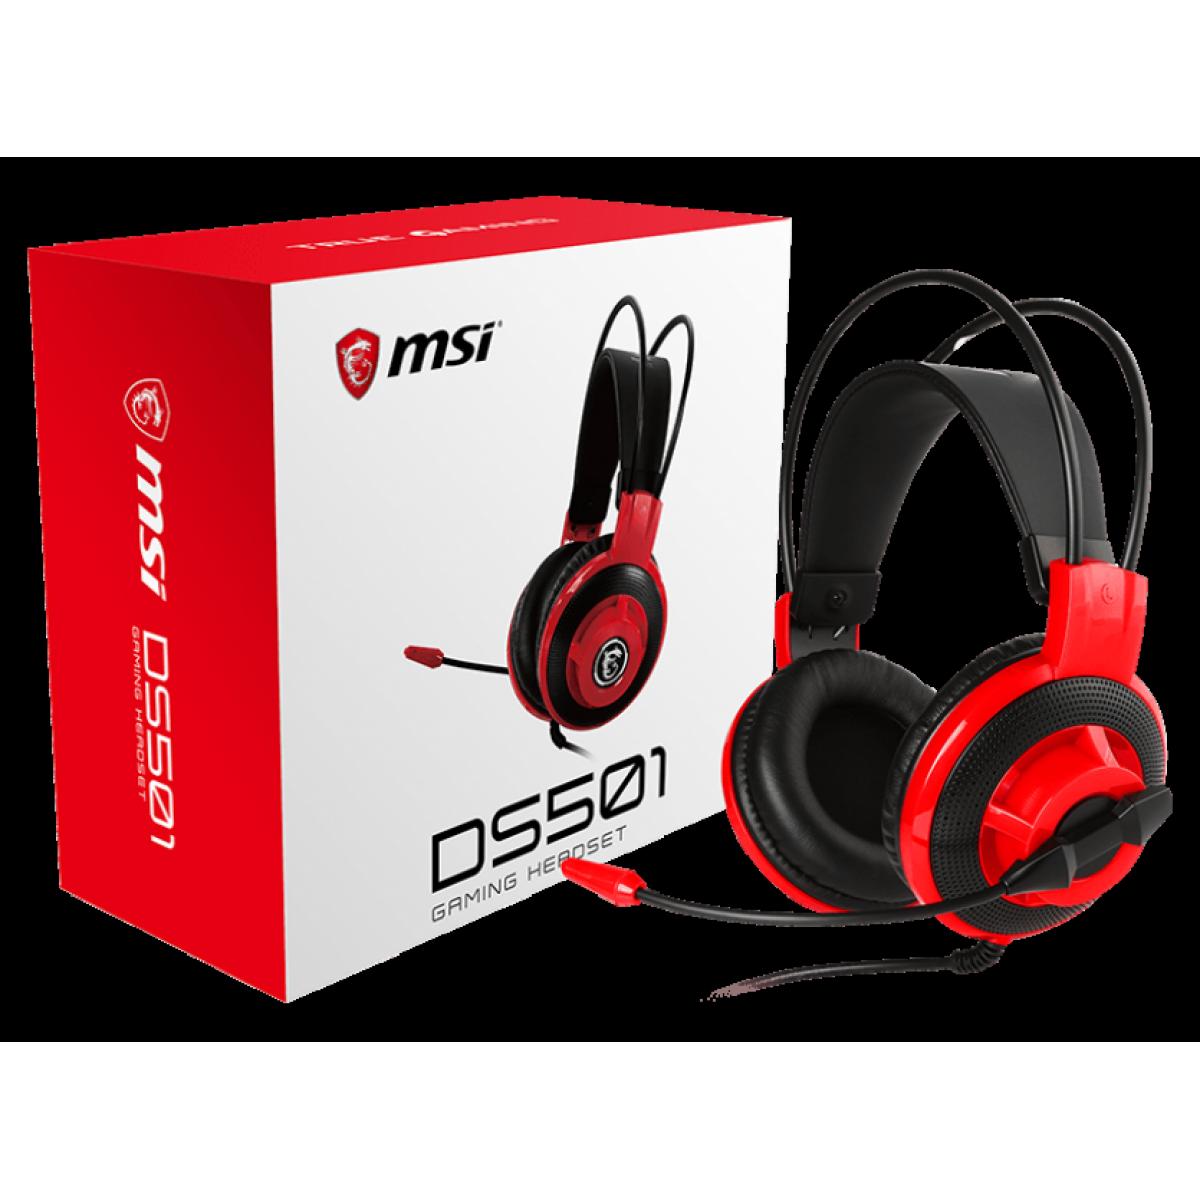 Headset Gamer MSI MS501, 3.5mm, Black/Red